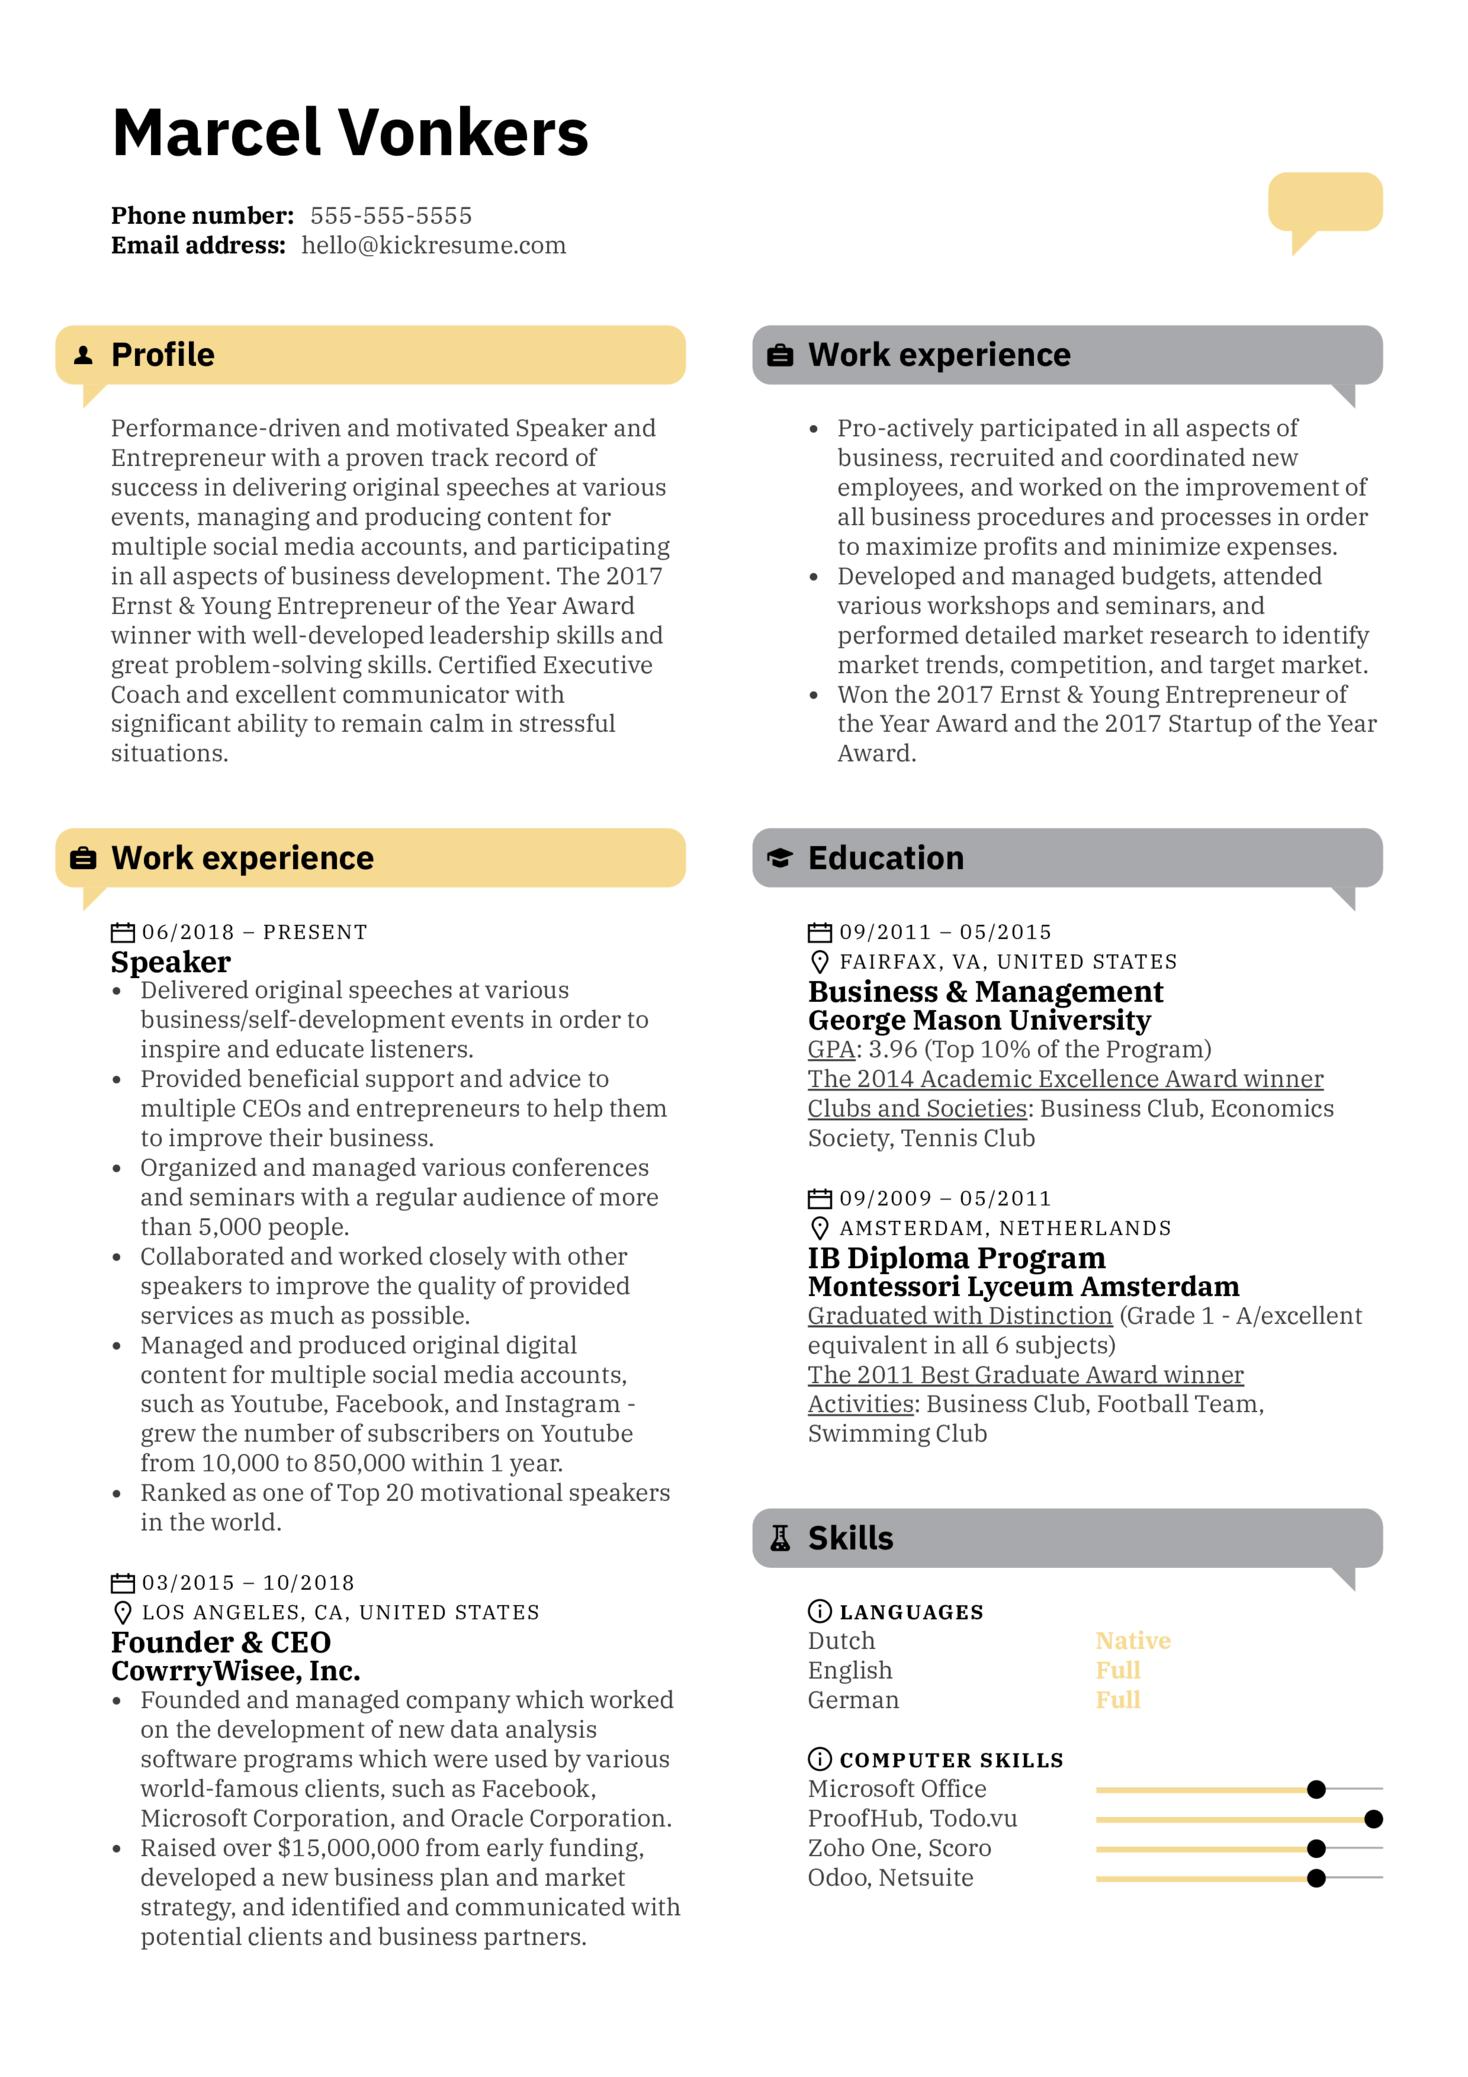 Speaker Resume Template (parte 1)